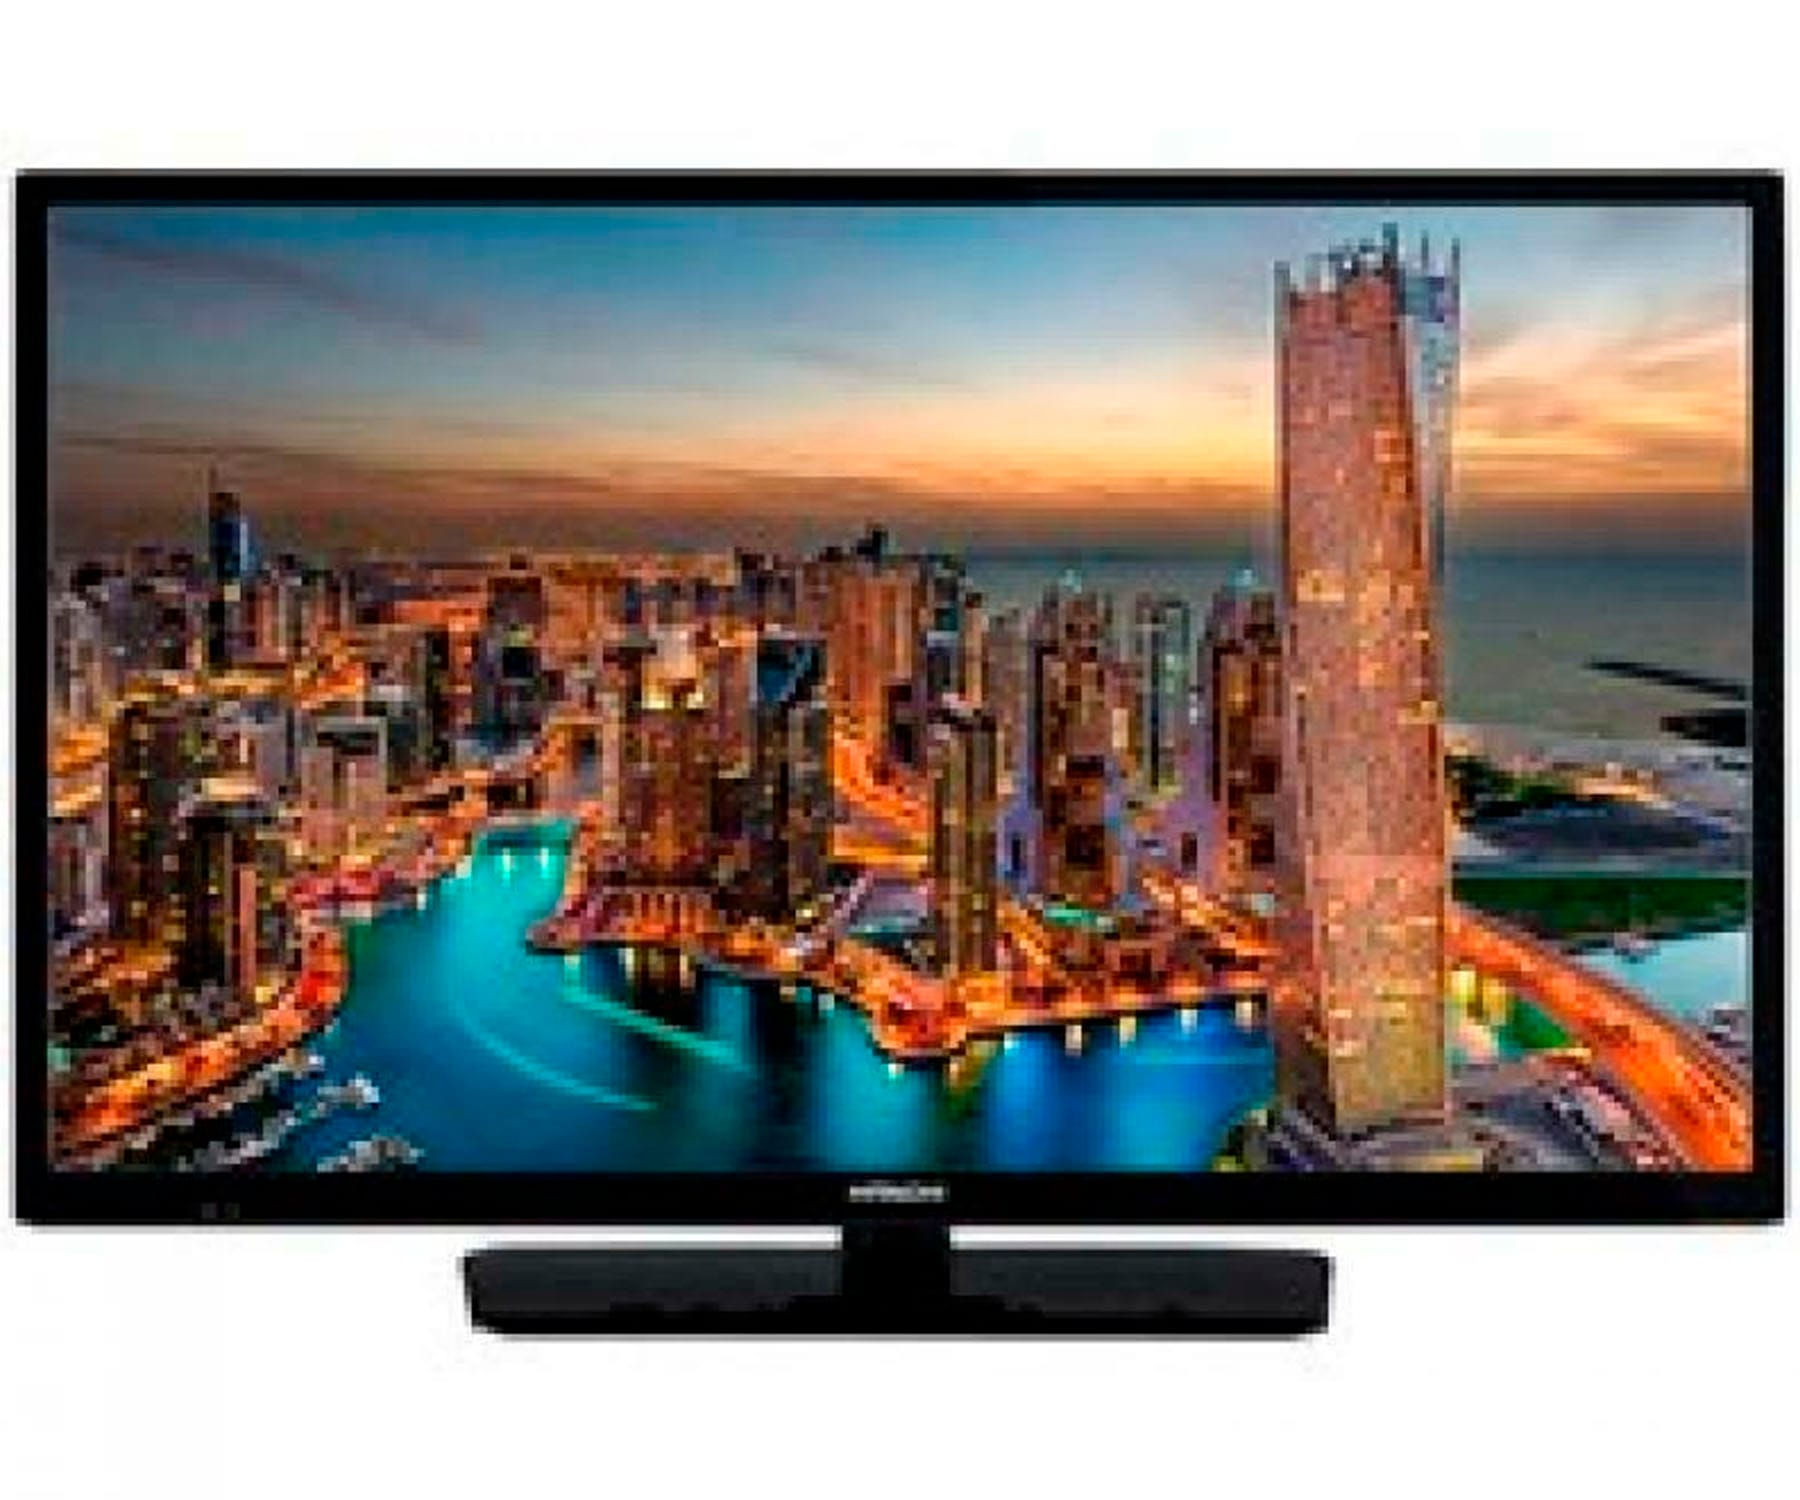 HITACHI 24HE2200 TELEVISOR 24'' LED HD READY HDR SMART TV 700BPI HDMI USB CON GOOGLE ASSISTANT